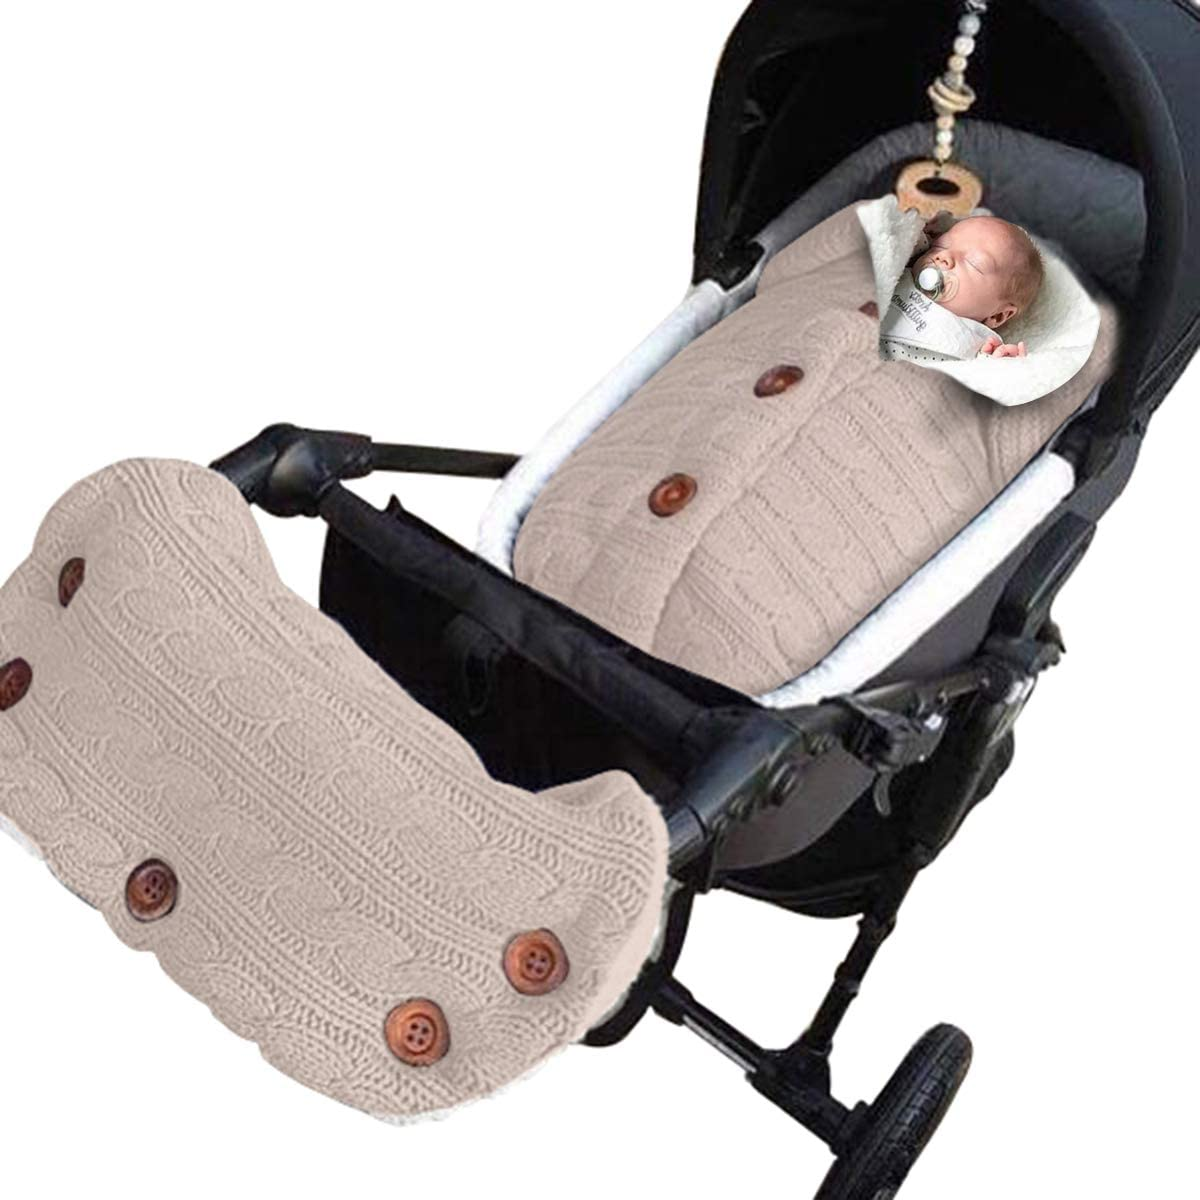 ROSEBEAR Newborn Baby Blanket Knit Warm Swaddle Wrap Sleeping Bag Stroller Warmer Gloves Baby Outdoor Baby Thick Warm Stroller Sleeping Bag